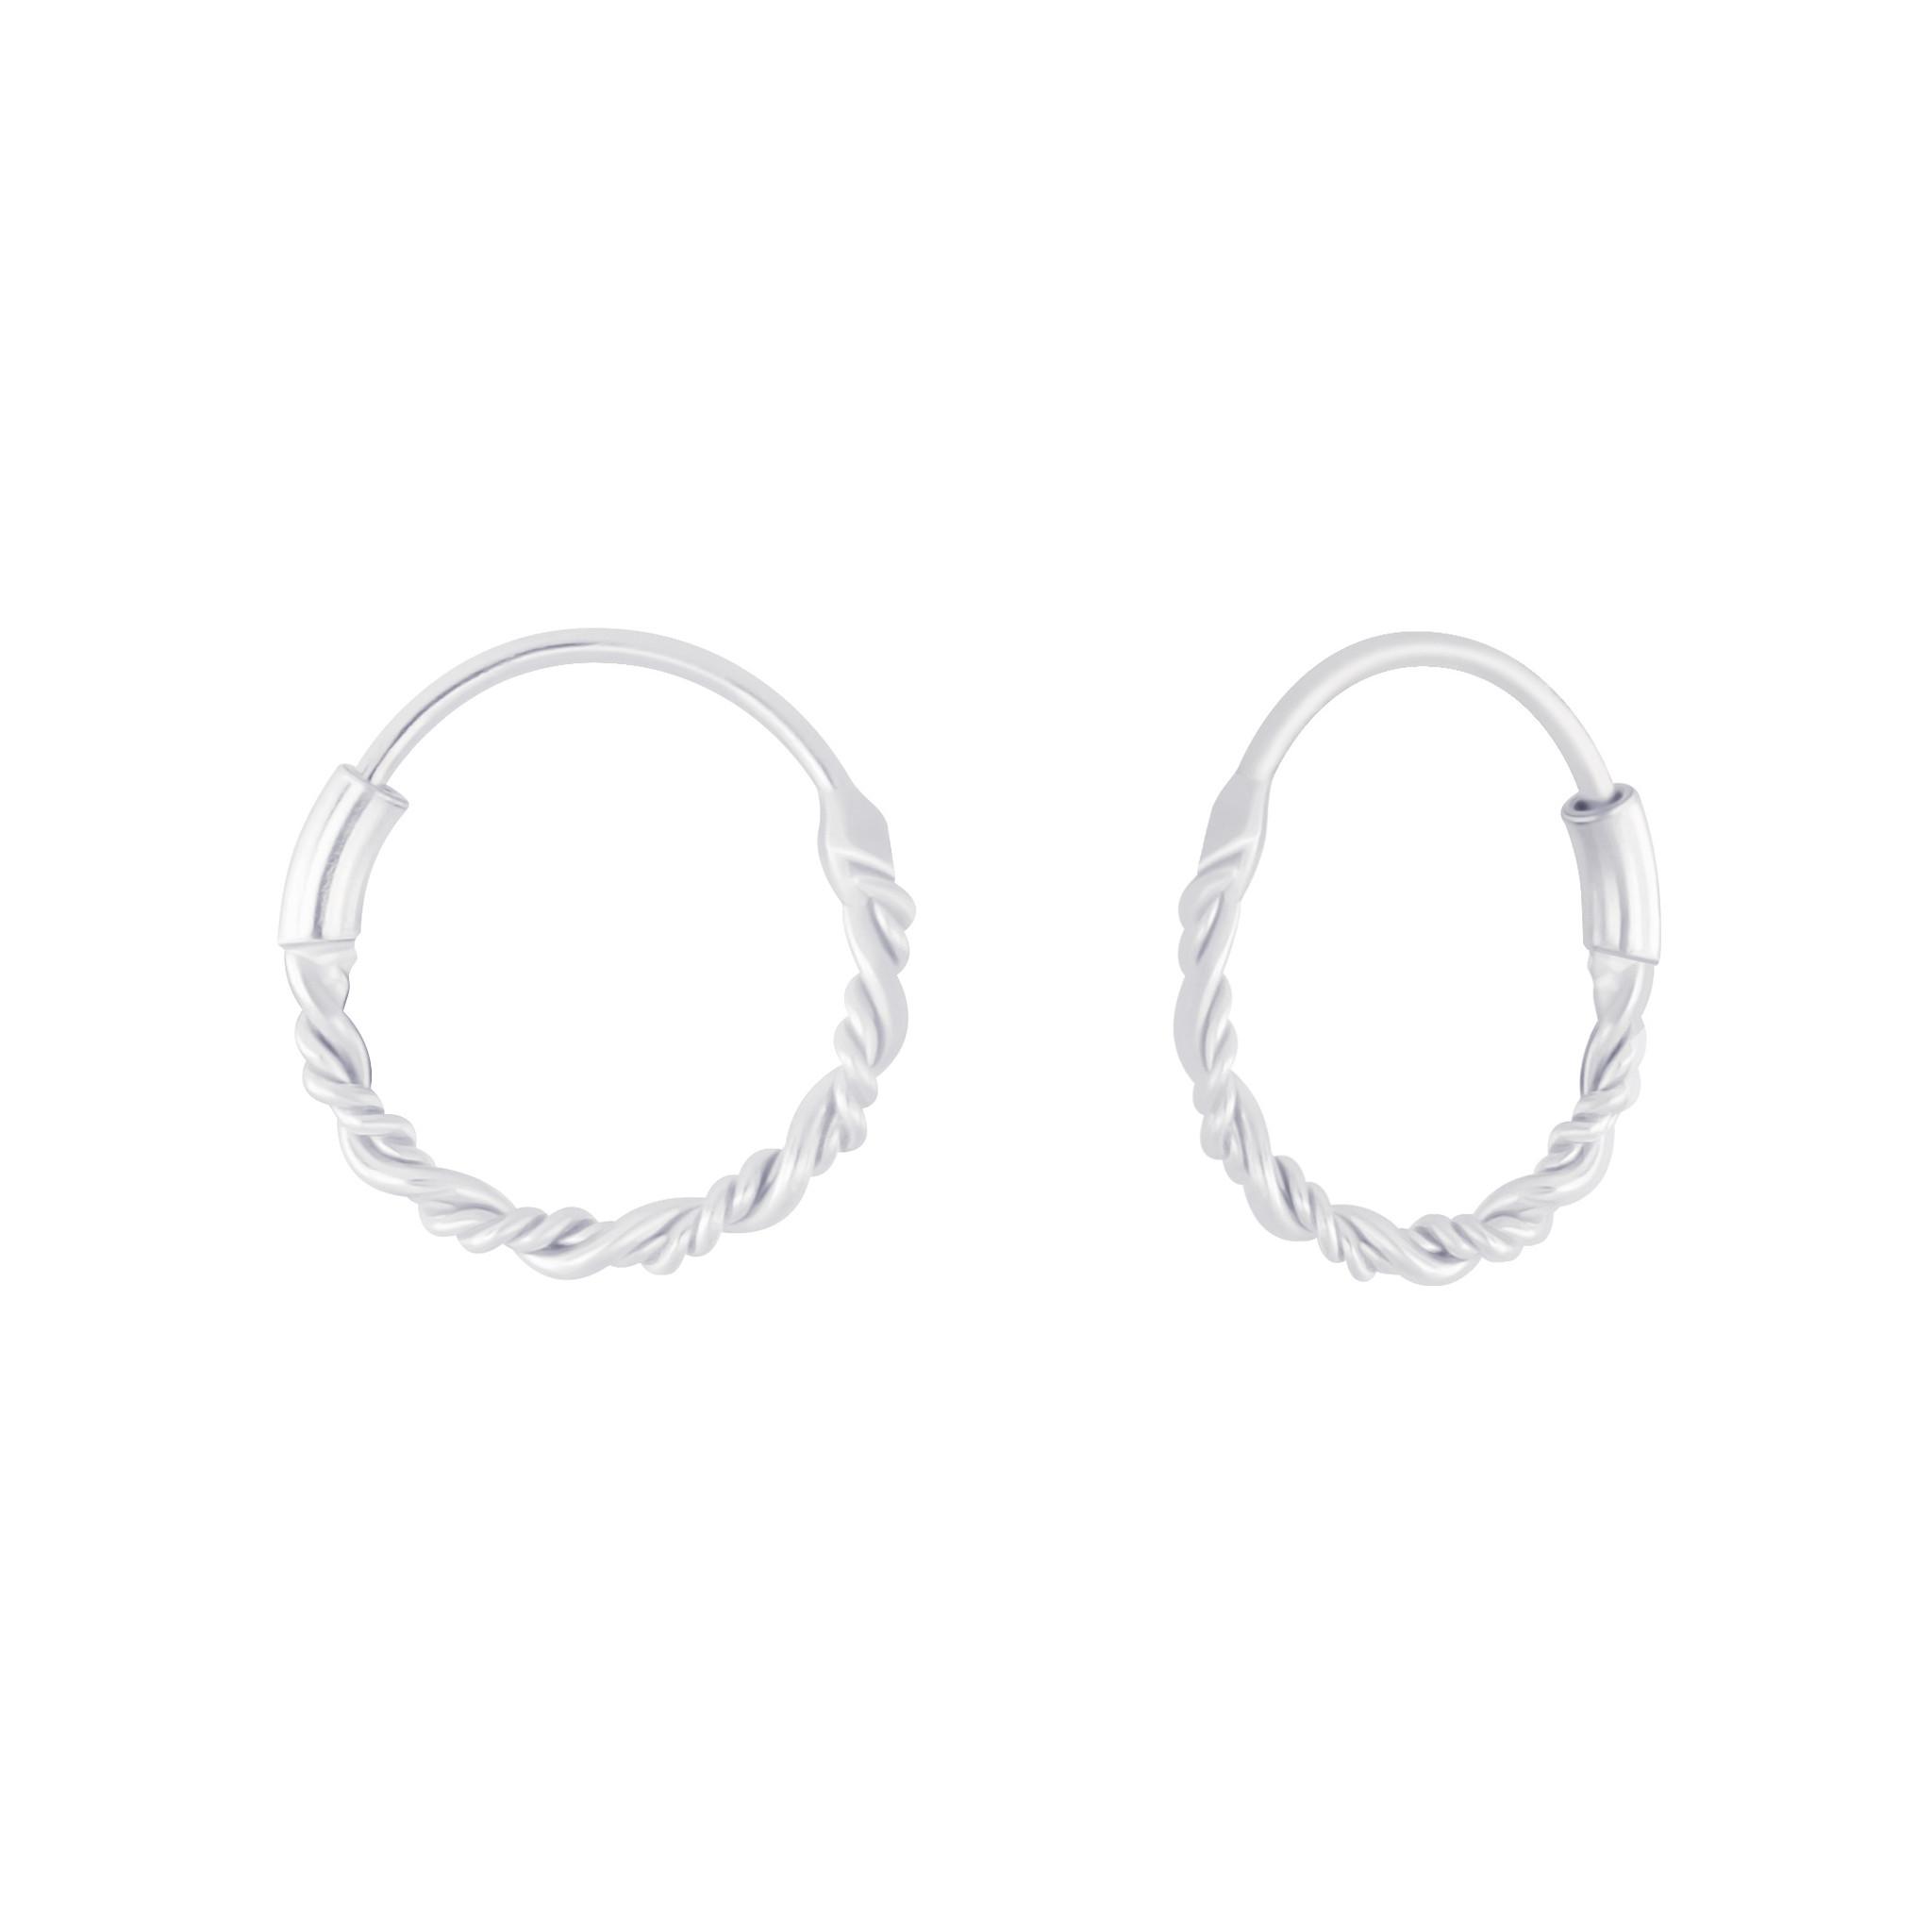 Small Hoops Earrings braided - 925 Sterling Silver-1